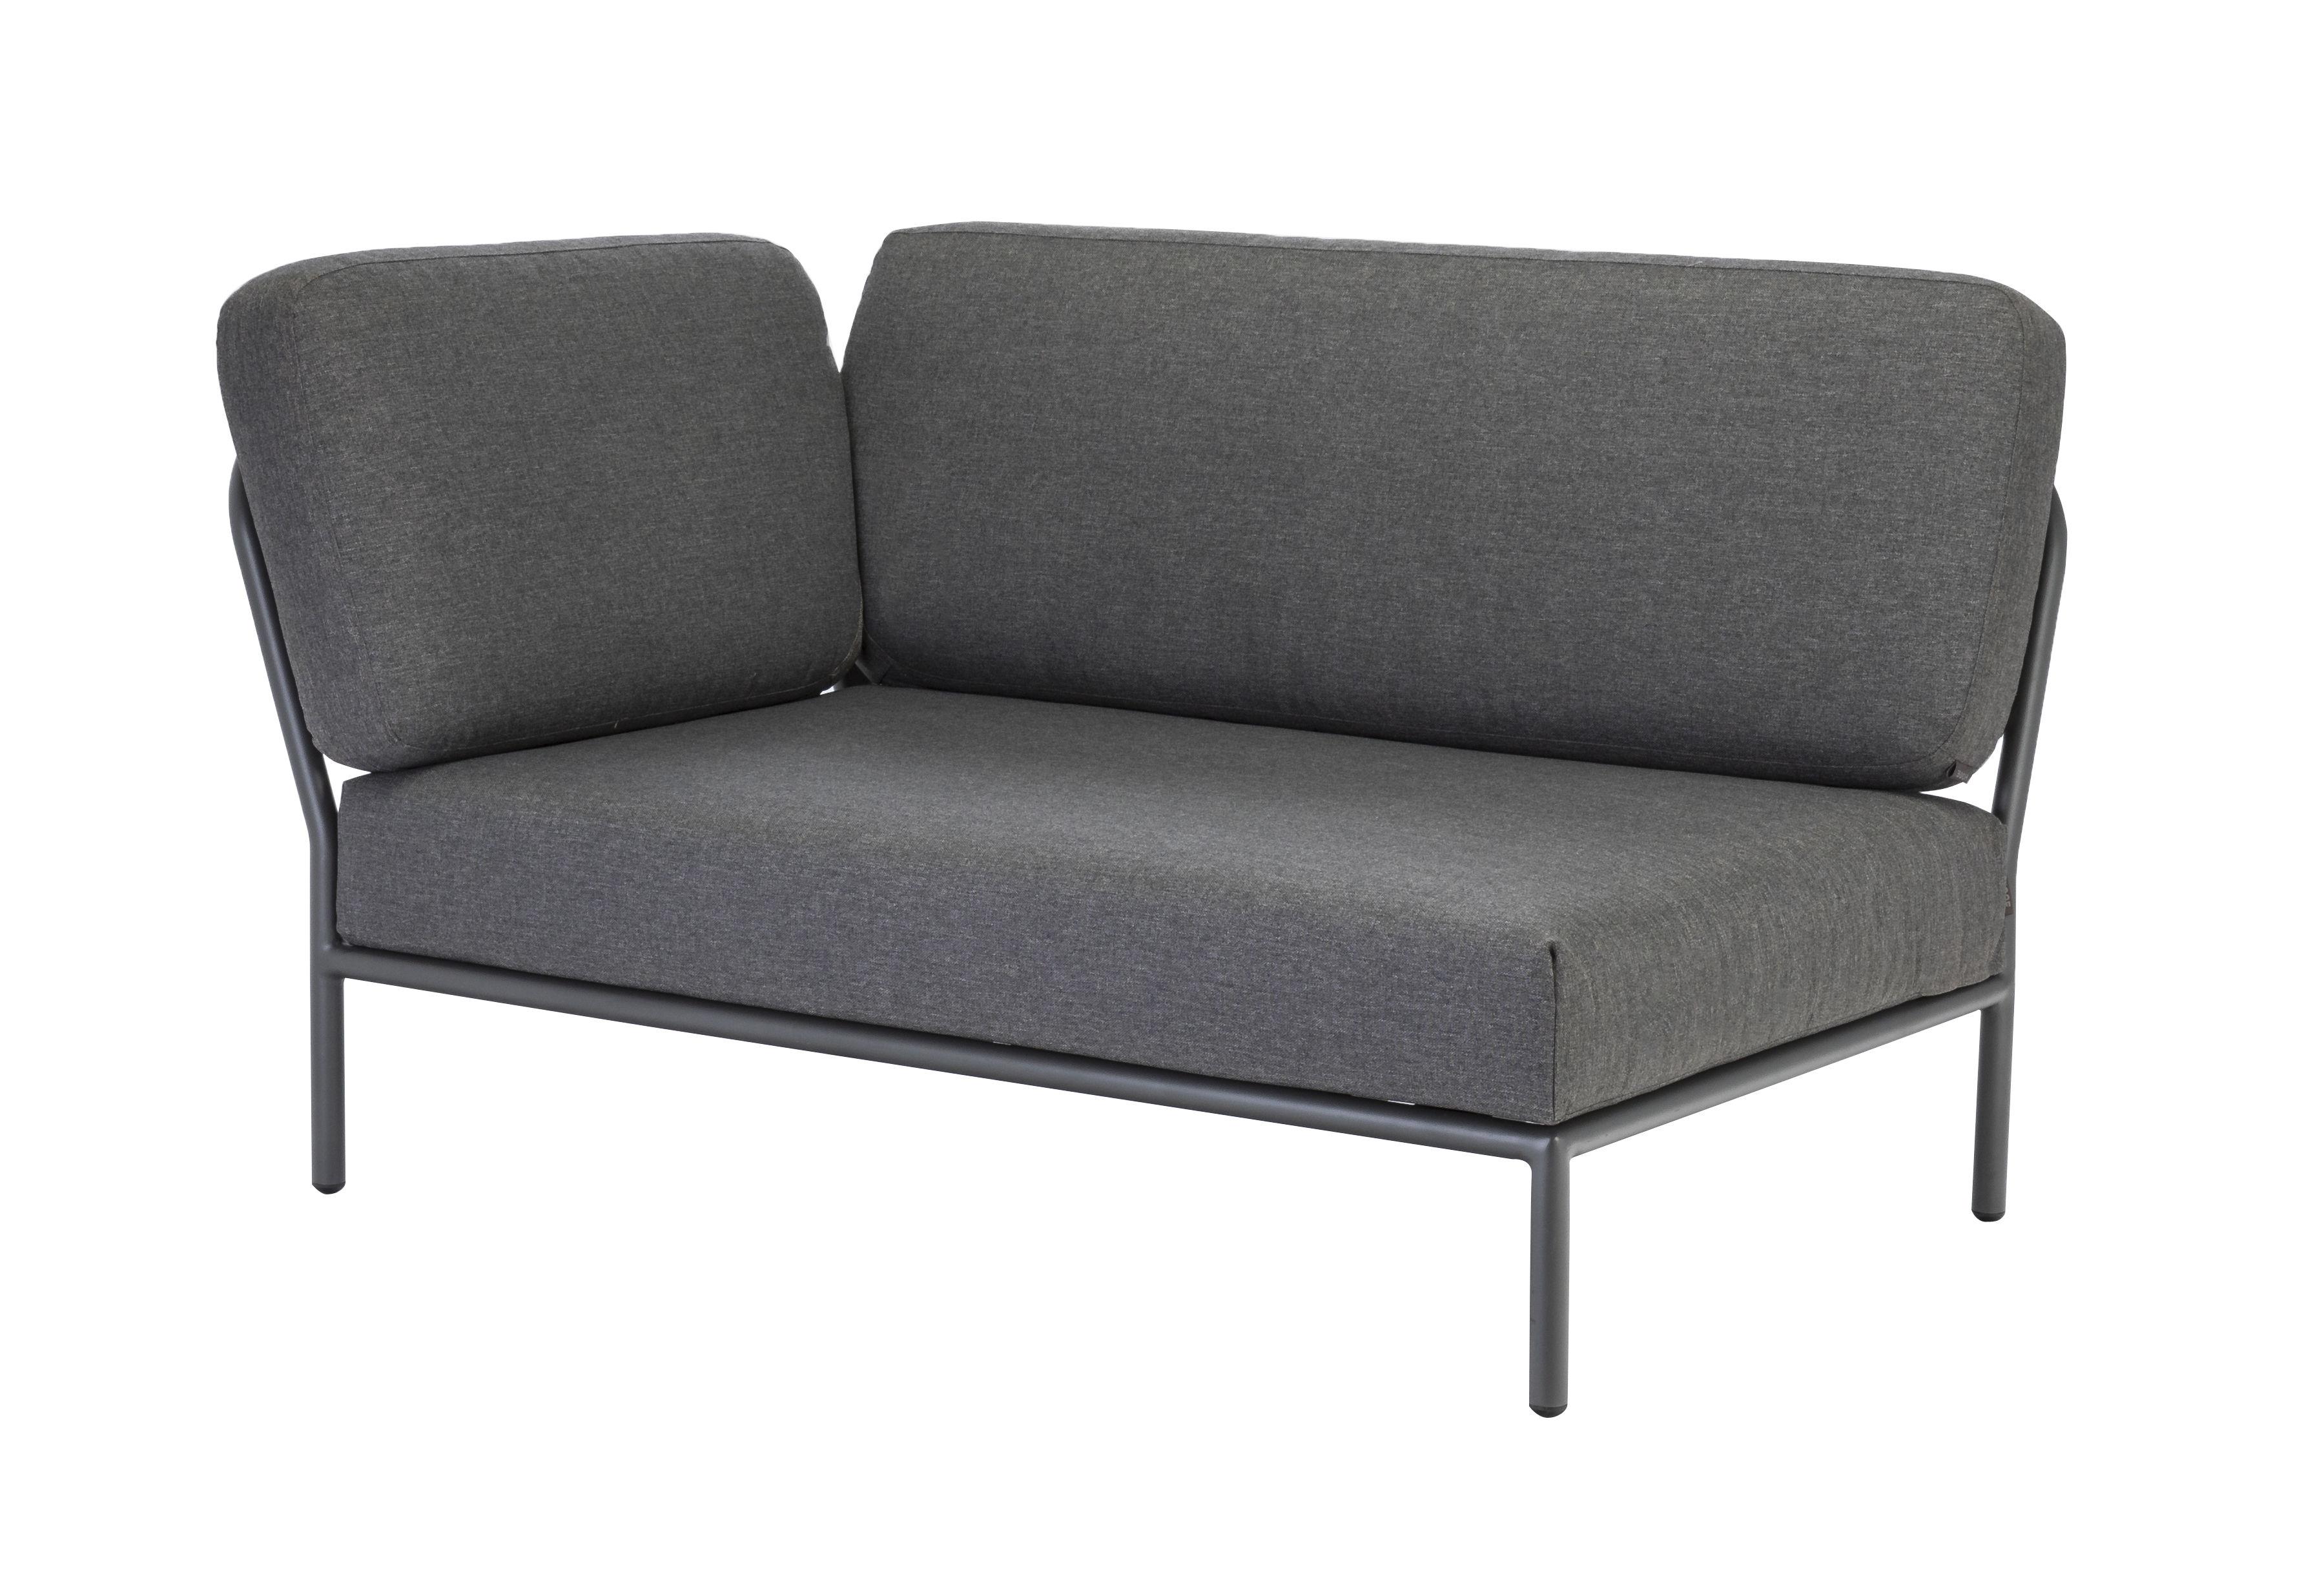 Mobilier - Canapés - Canapé modulable Level / Module angle gauche - Tissu - Houe - Angle gauche / Gris - Aluminium thermo-laqué, Mousse polyuréthane, Tissu polyester